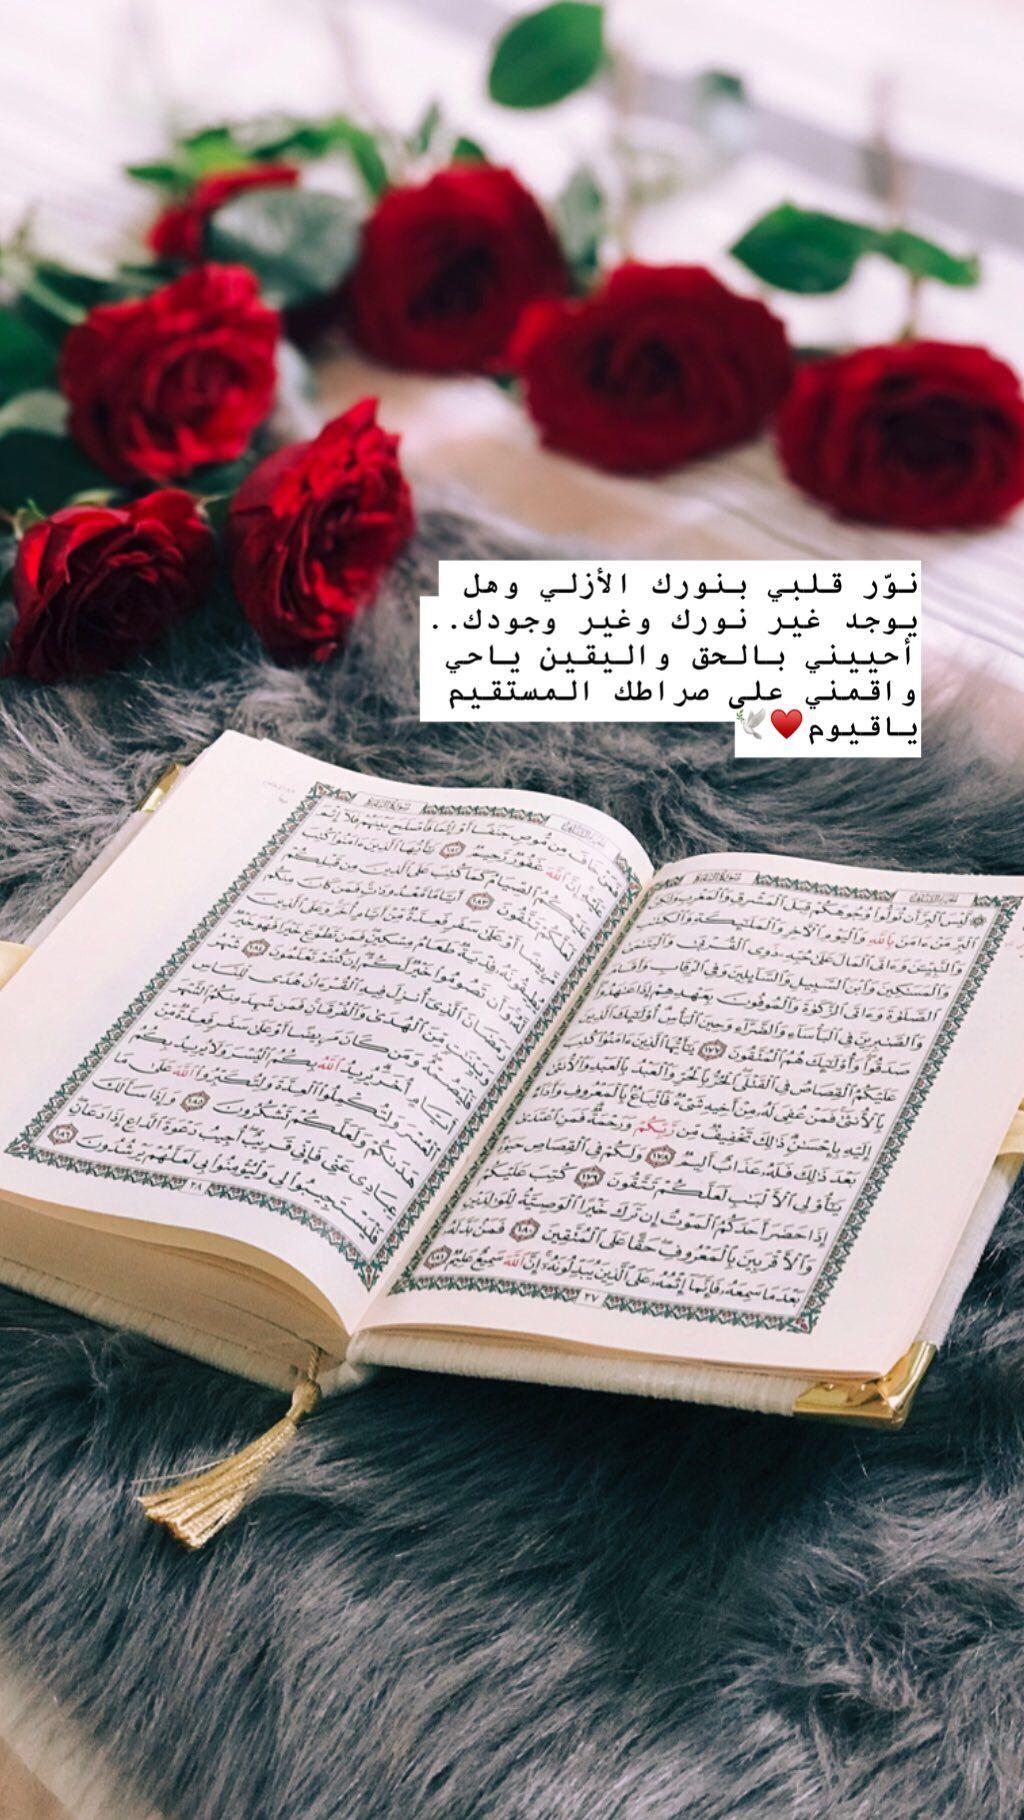 Insta Hind99alsalem Arabic Quotes Quran Crafts